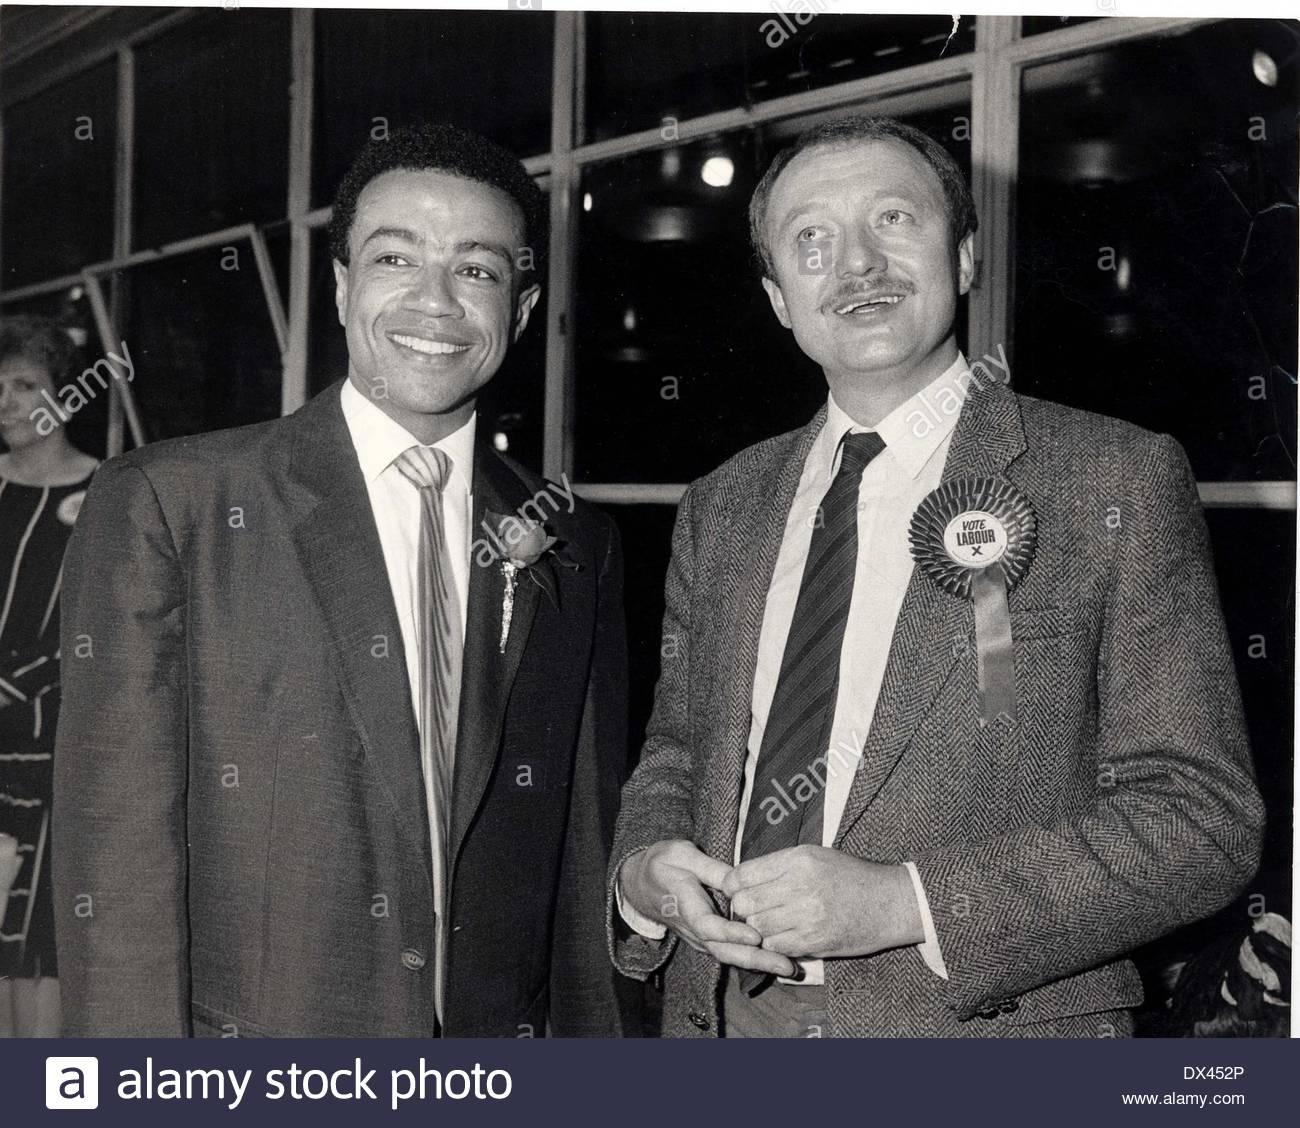 Ken Livingstone - Politician Paul Boateng (left) Stock Photo